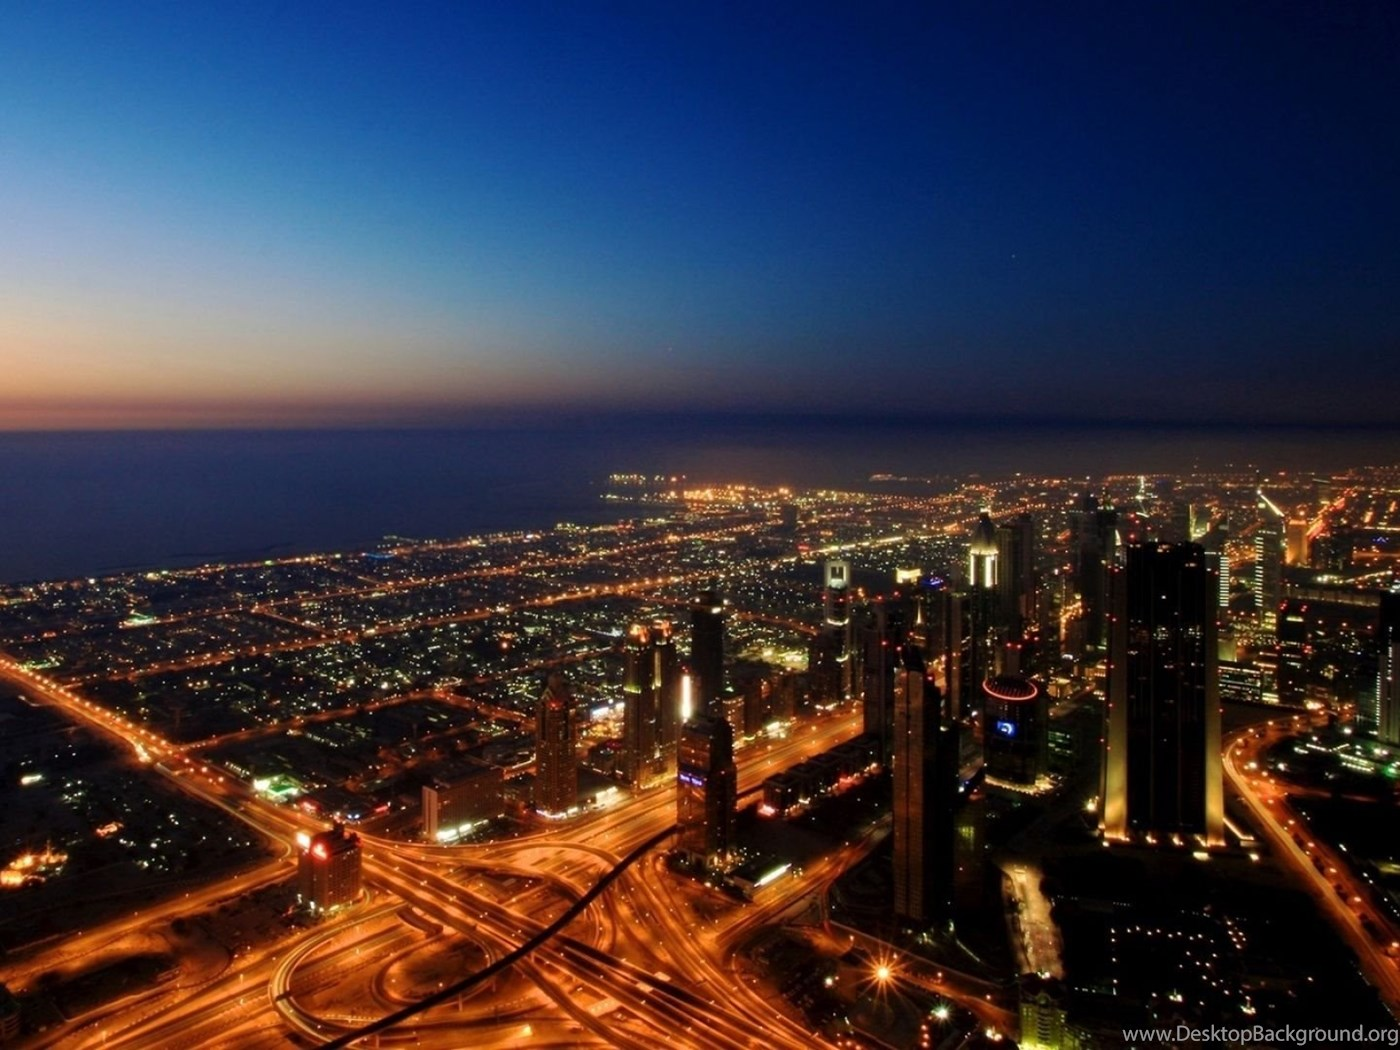 Full Hd 1080p Dubai Wallpapers Hd Desktop Backgrounds 1920x1080